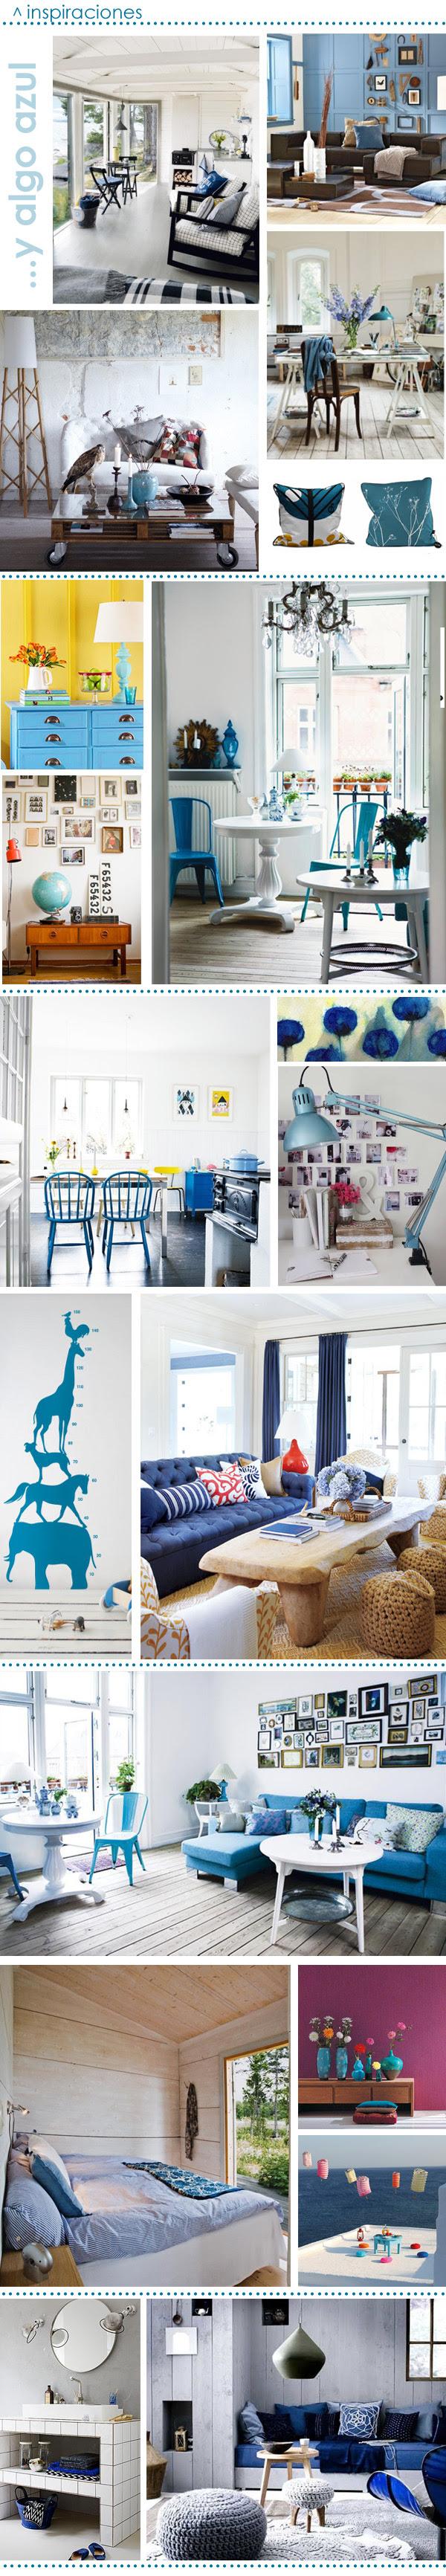 decoracion-reforma-interiorismo-inspiracion_salon-salon_azul-decoracion_azul-interiorismo_azul-diseño_escandinavo_azul-tres_studio-scandinavian_design-blue